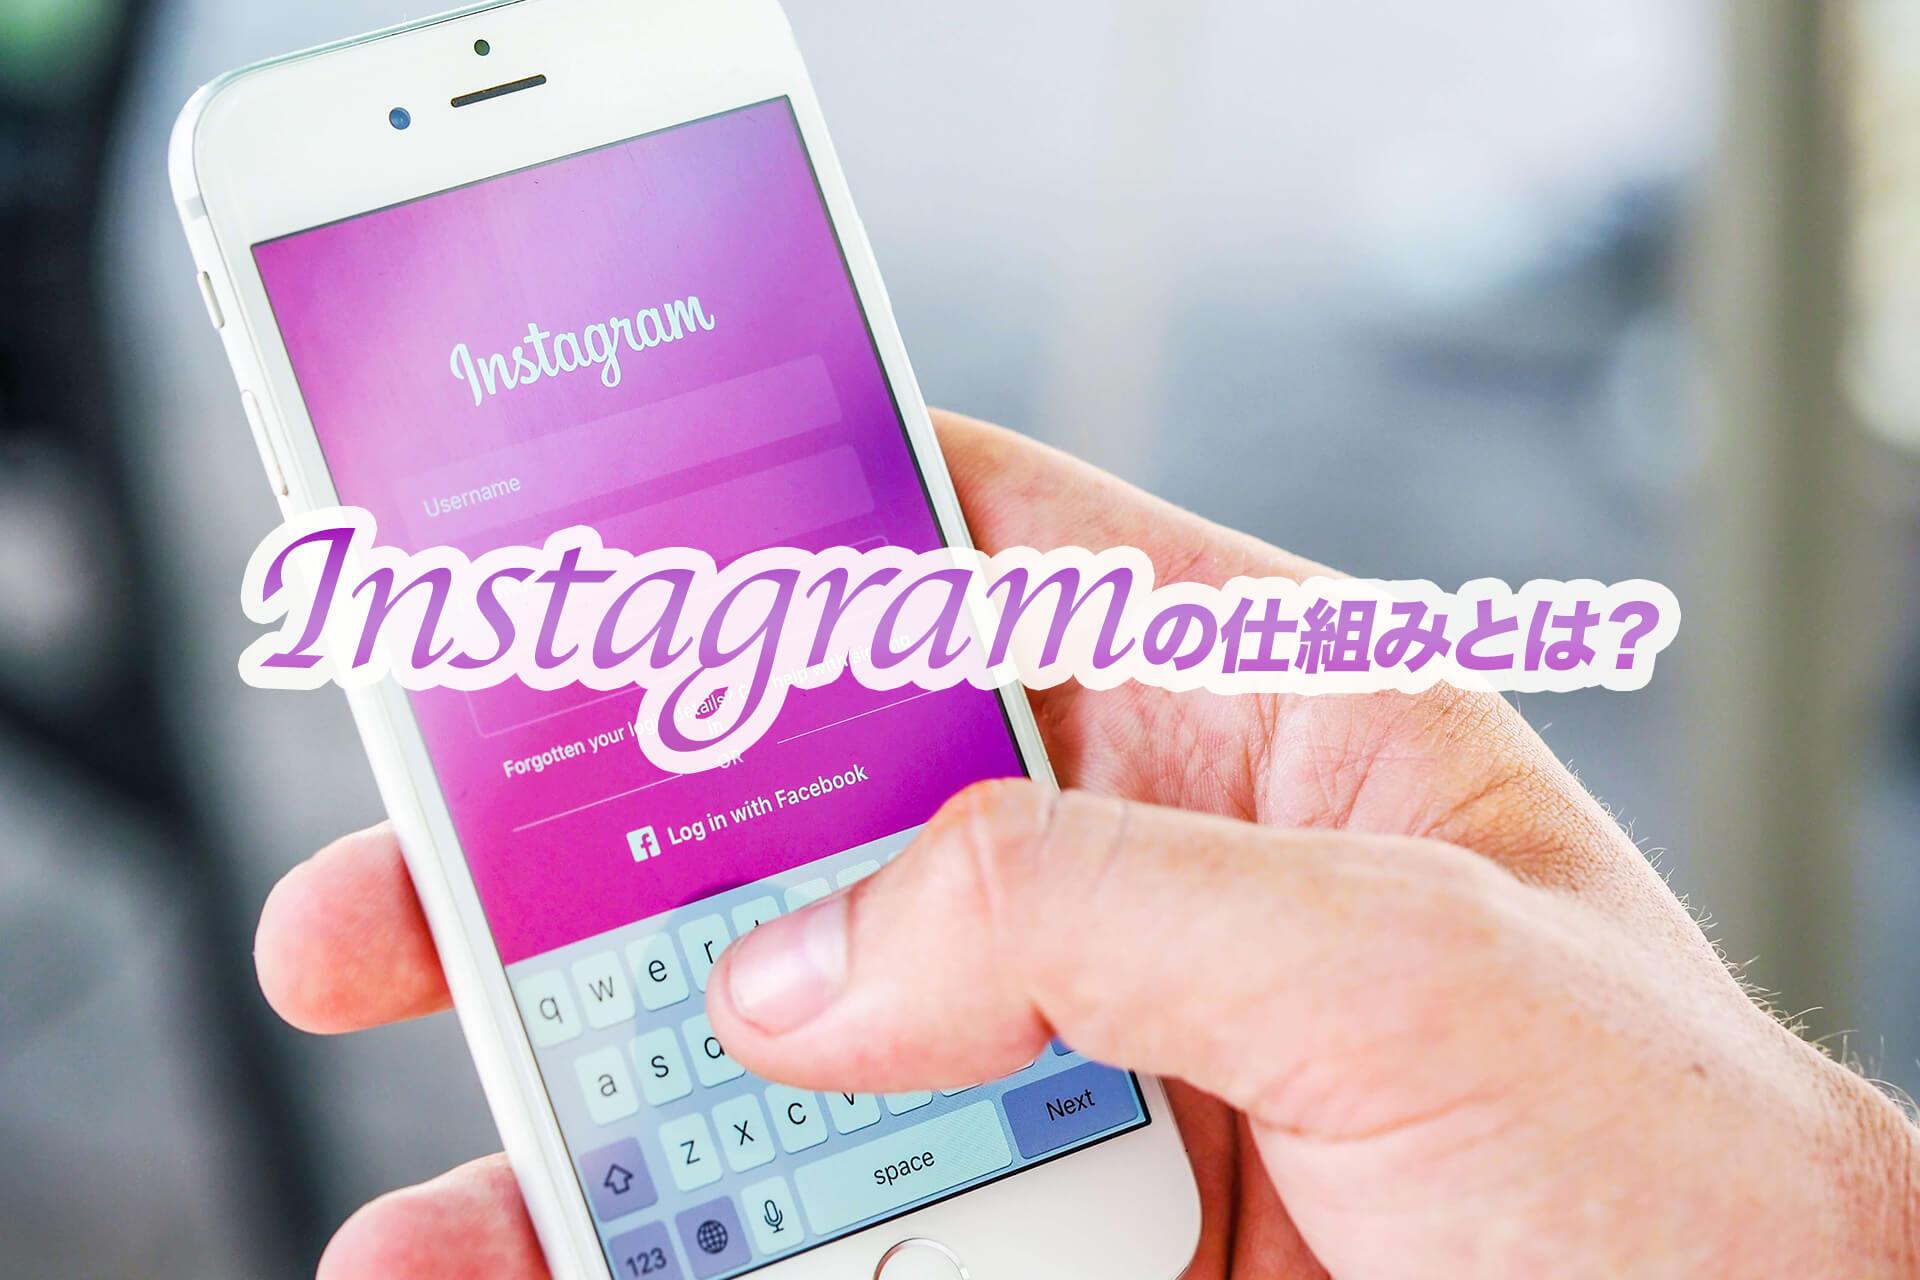 Instagramの仕組みとは?全体の利用状況と共に解説!